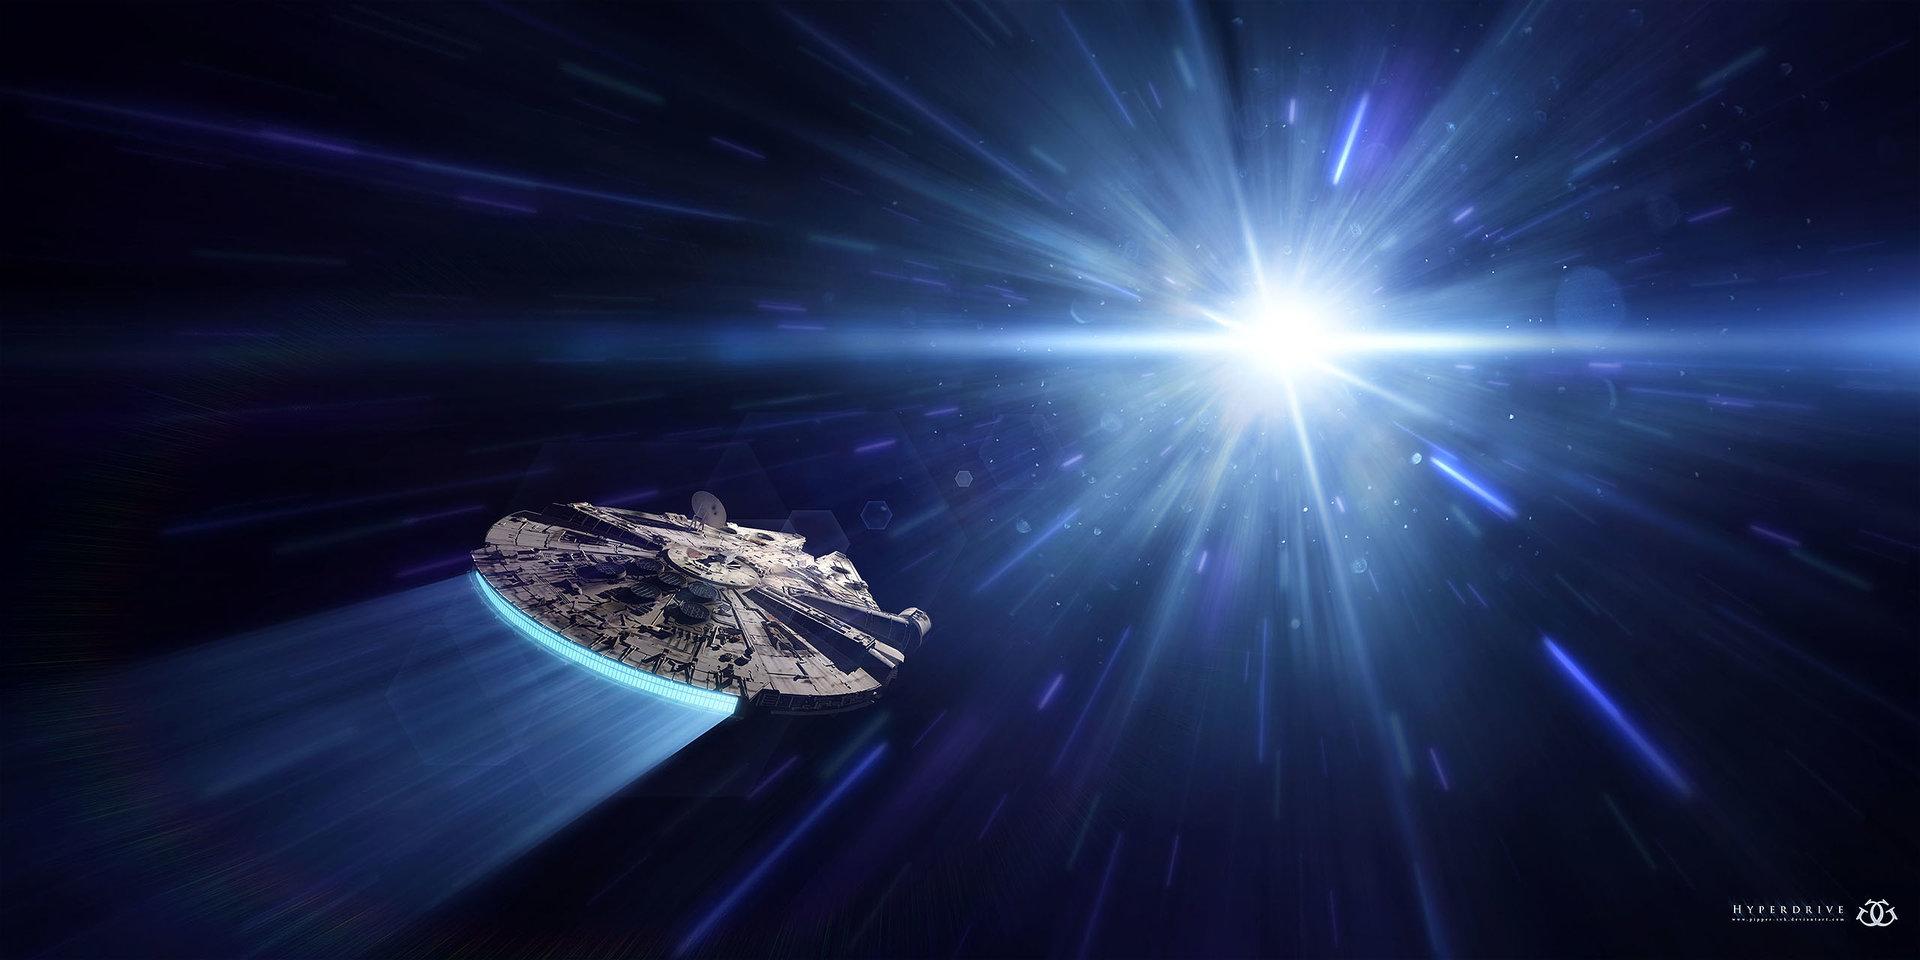 BreakThrough starshot spaceship ship travel star alpha centauri centaure étoile vitesse de la lumière